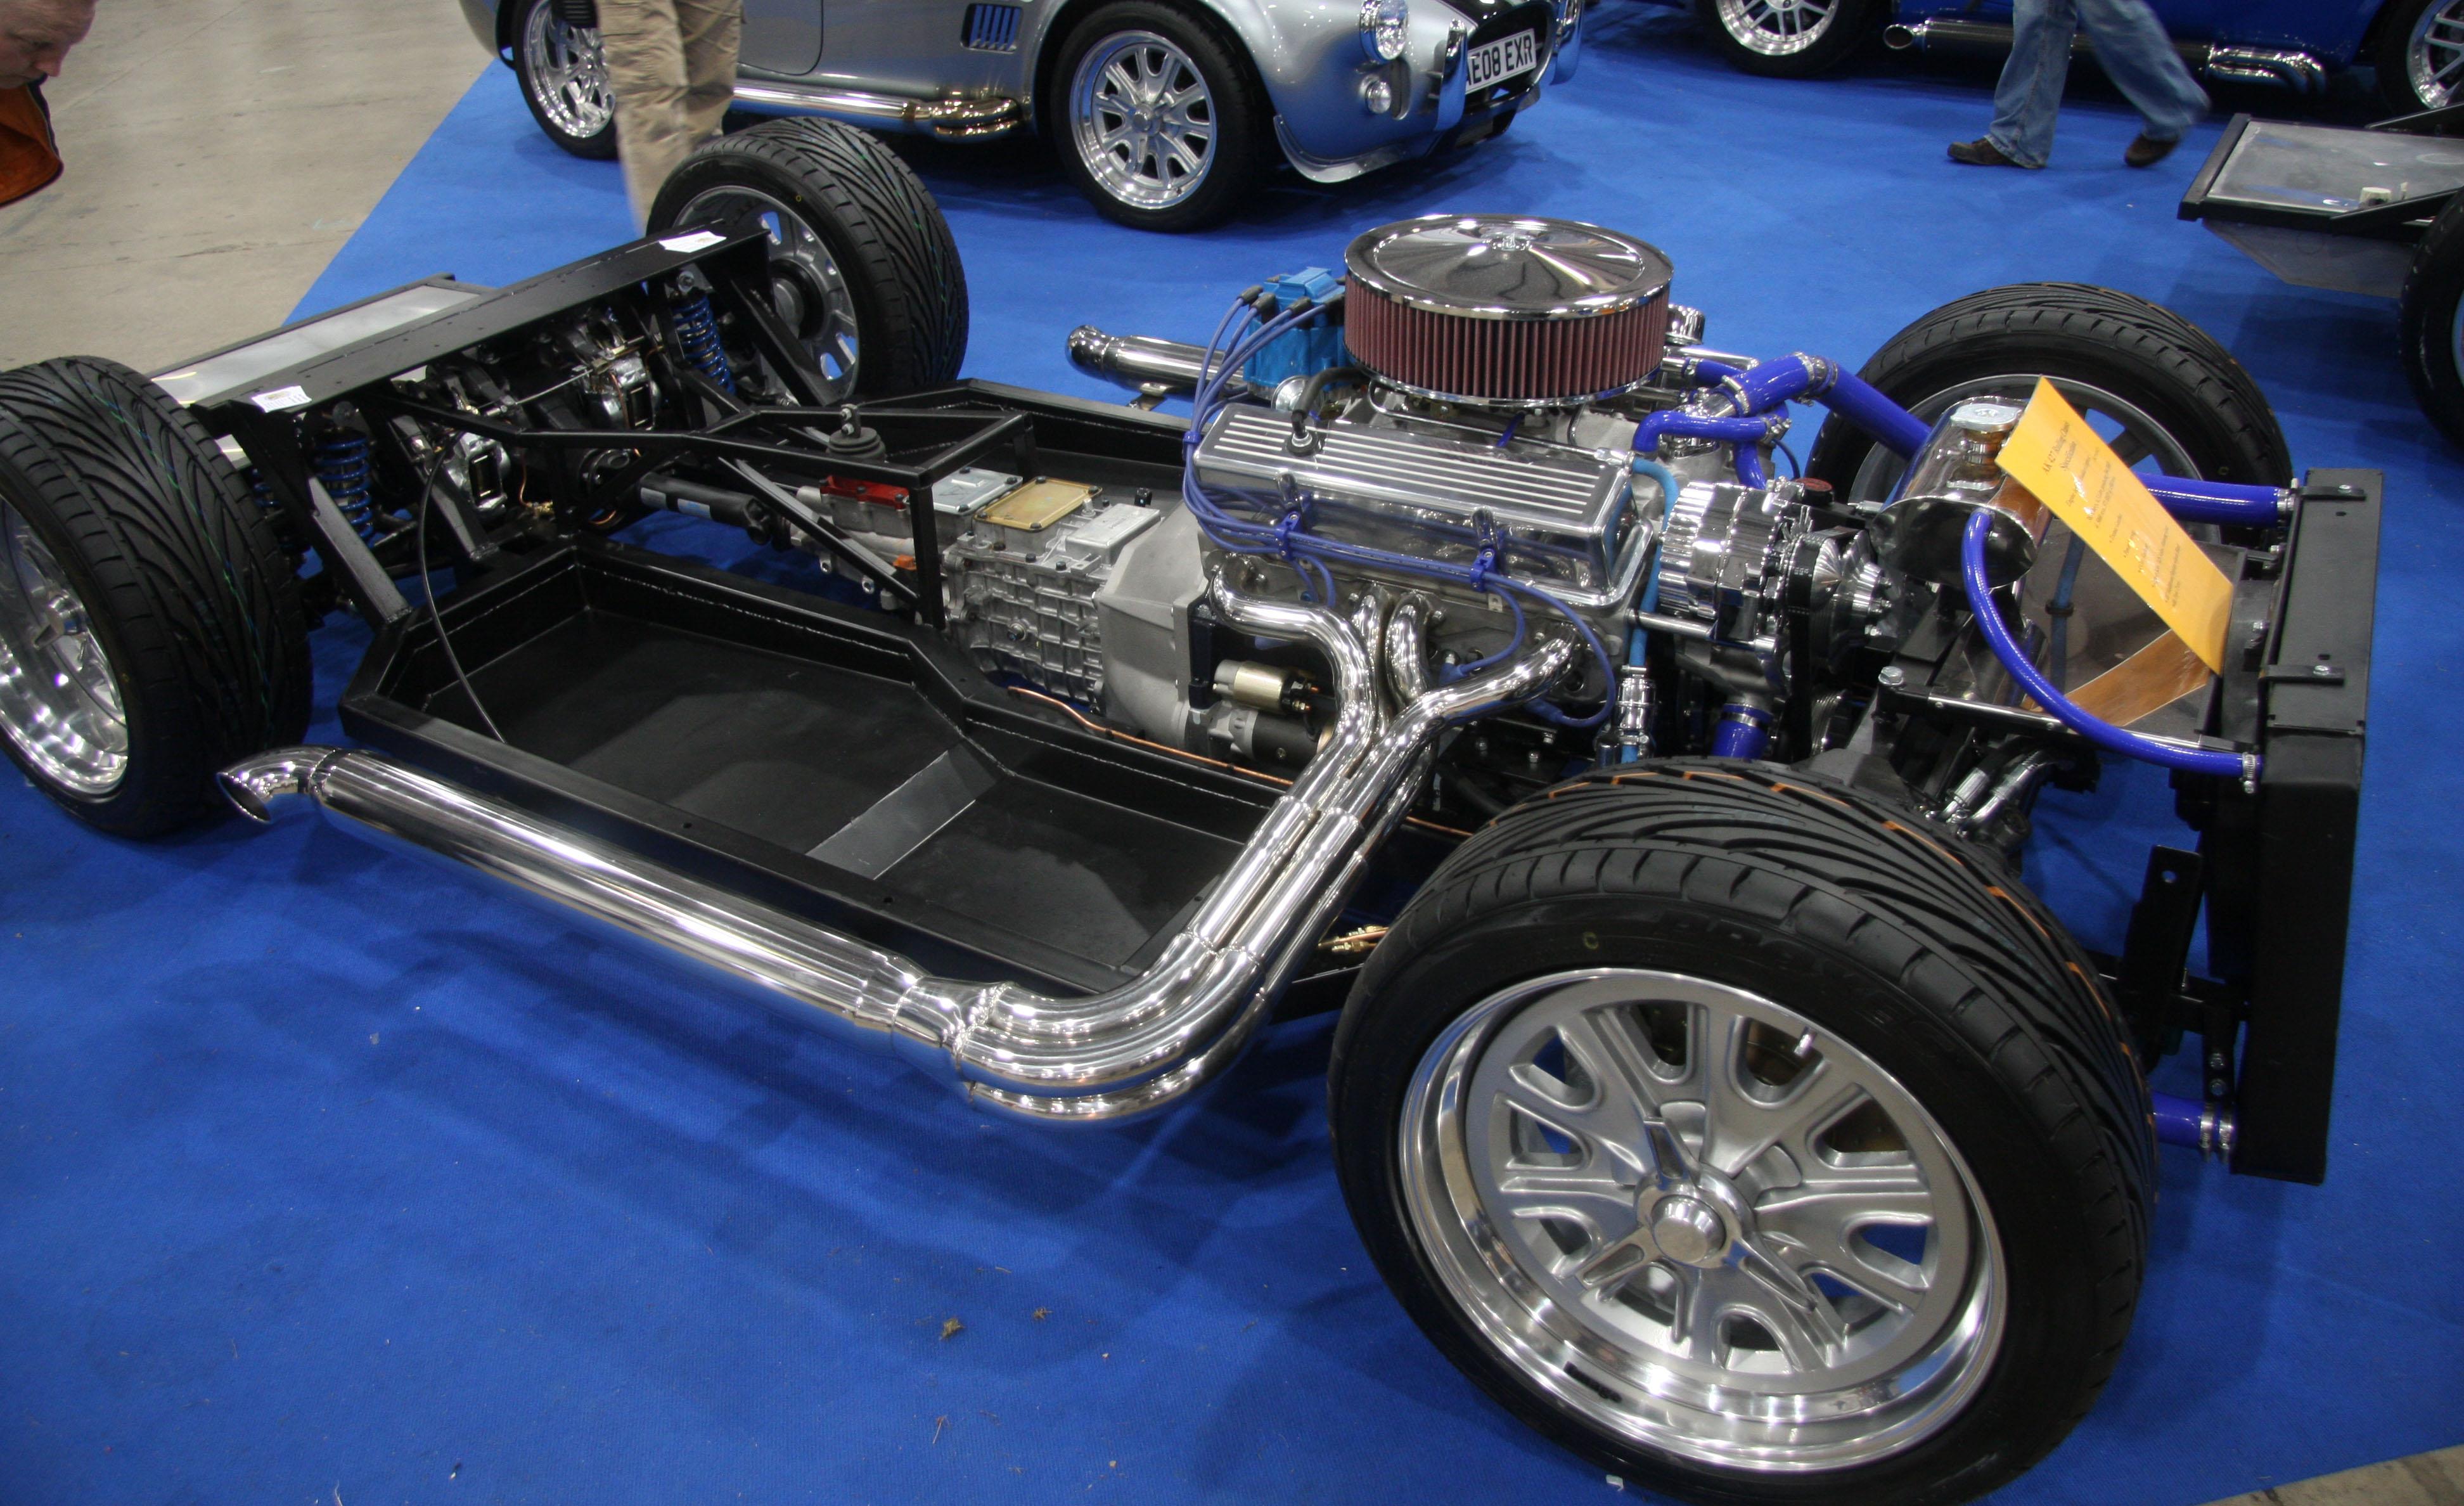 Ac Cobra Kit Car >> File:AK 427 Cobra replica rolling chassis - Flickr - exfordy (2).jpg - Wikimedia Commons